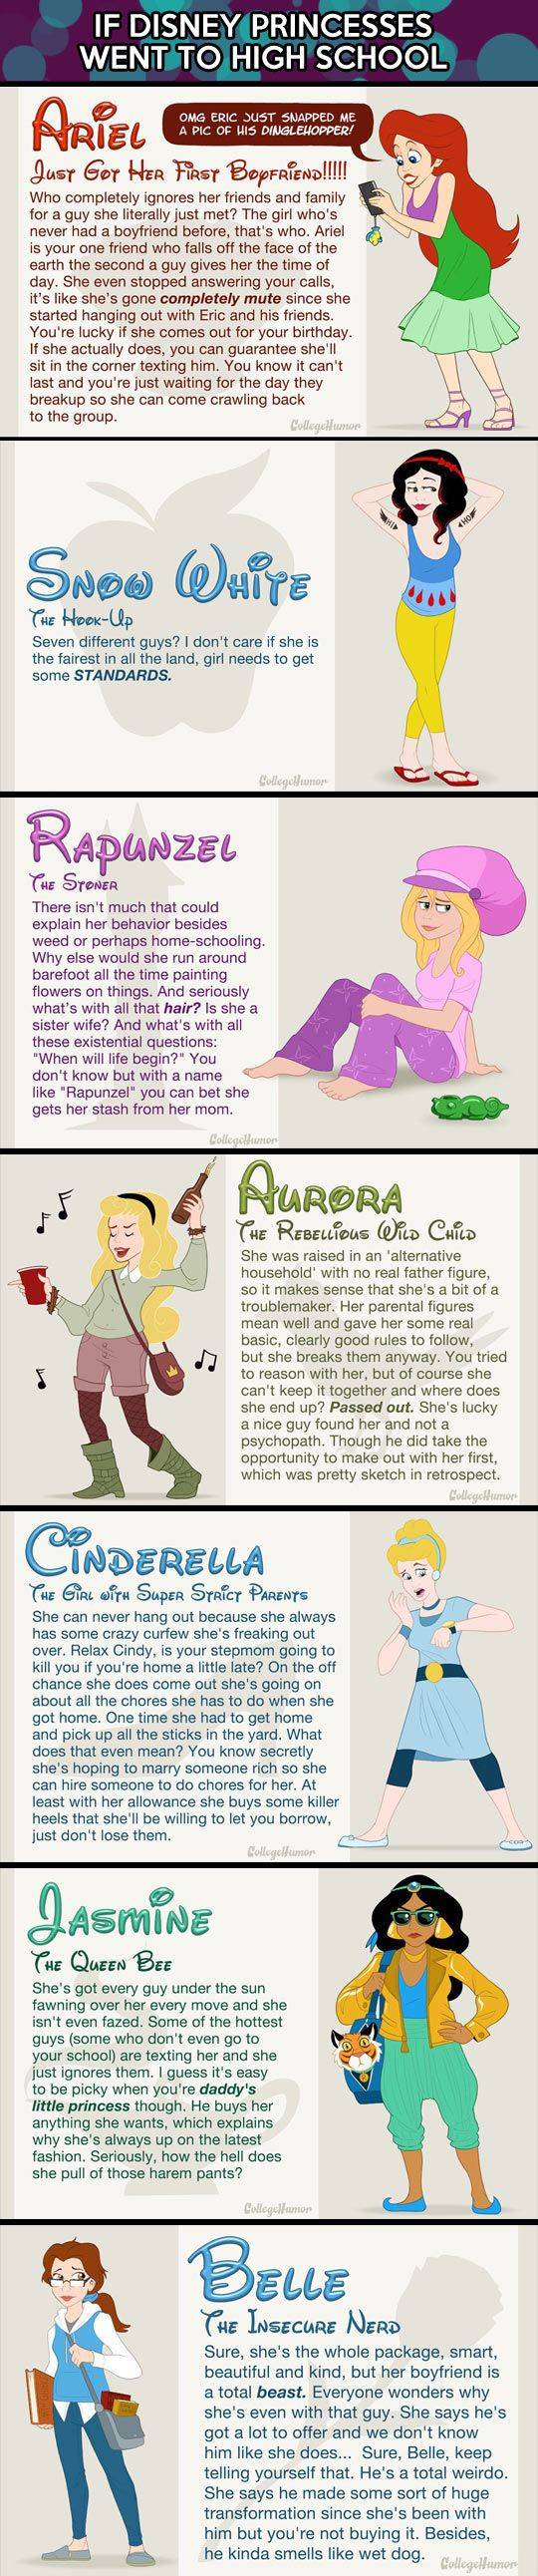 If Disney Princesses went to high school…